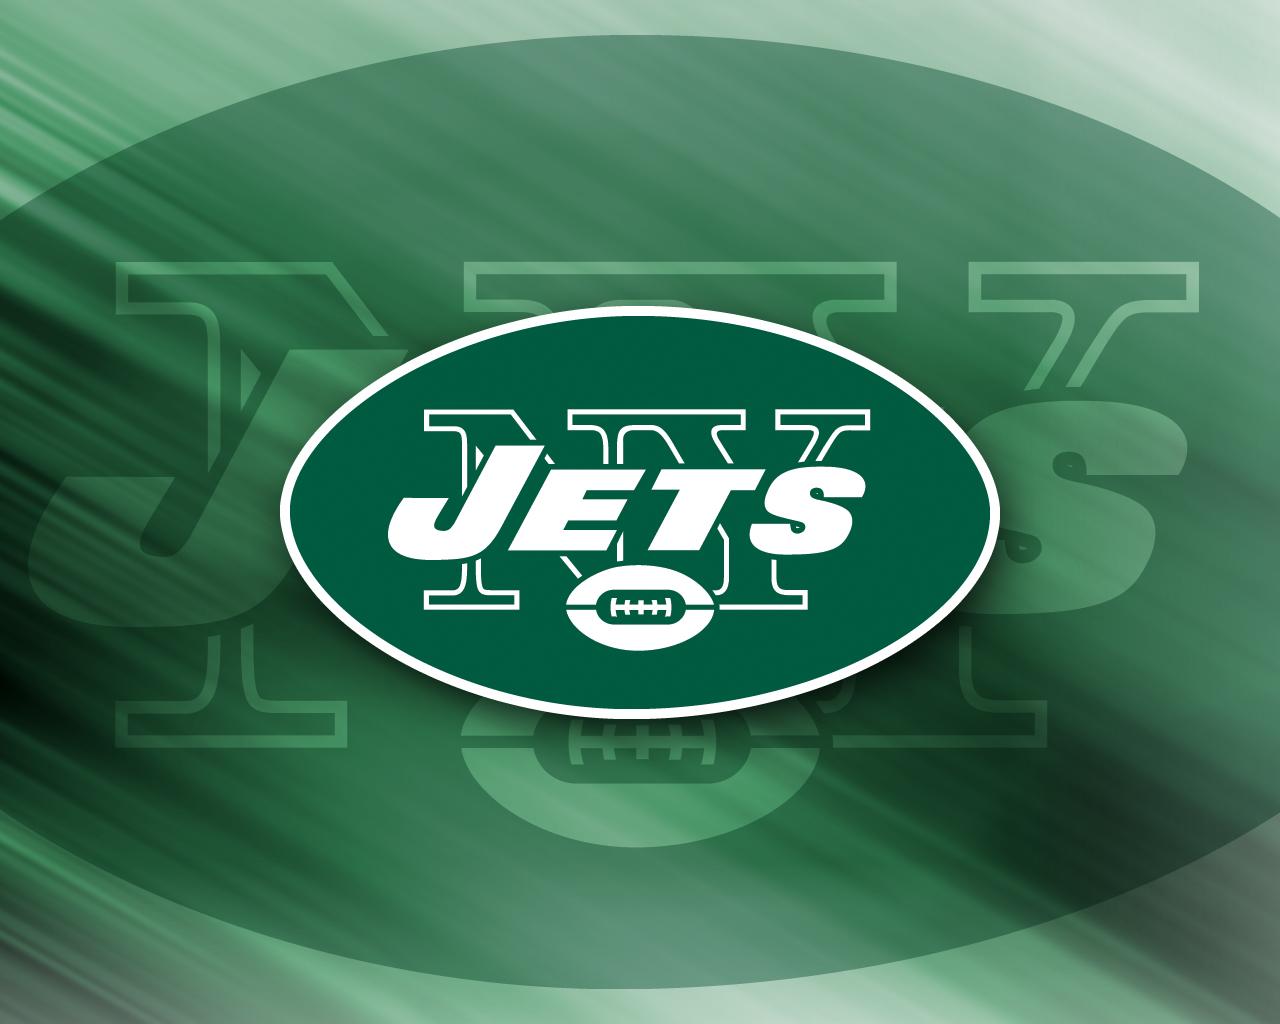 Enjoy this New York Jets background